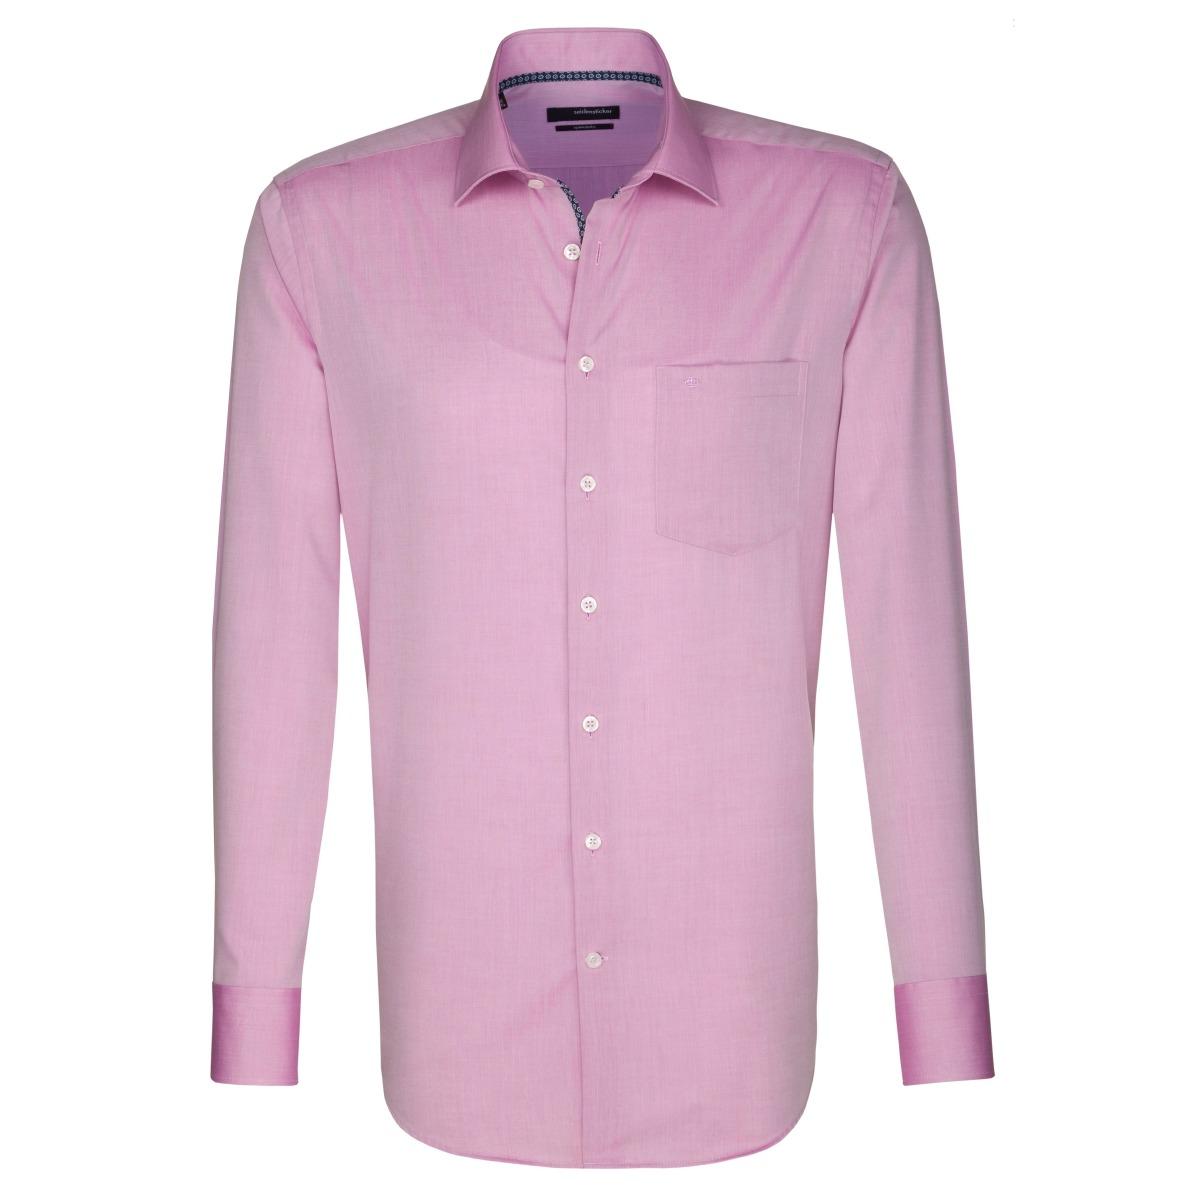 W M EGO. Růžová pánská košile SEIDENSTICKER 90ed91c534